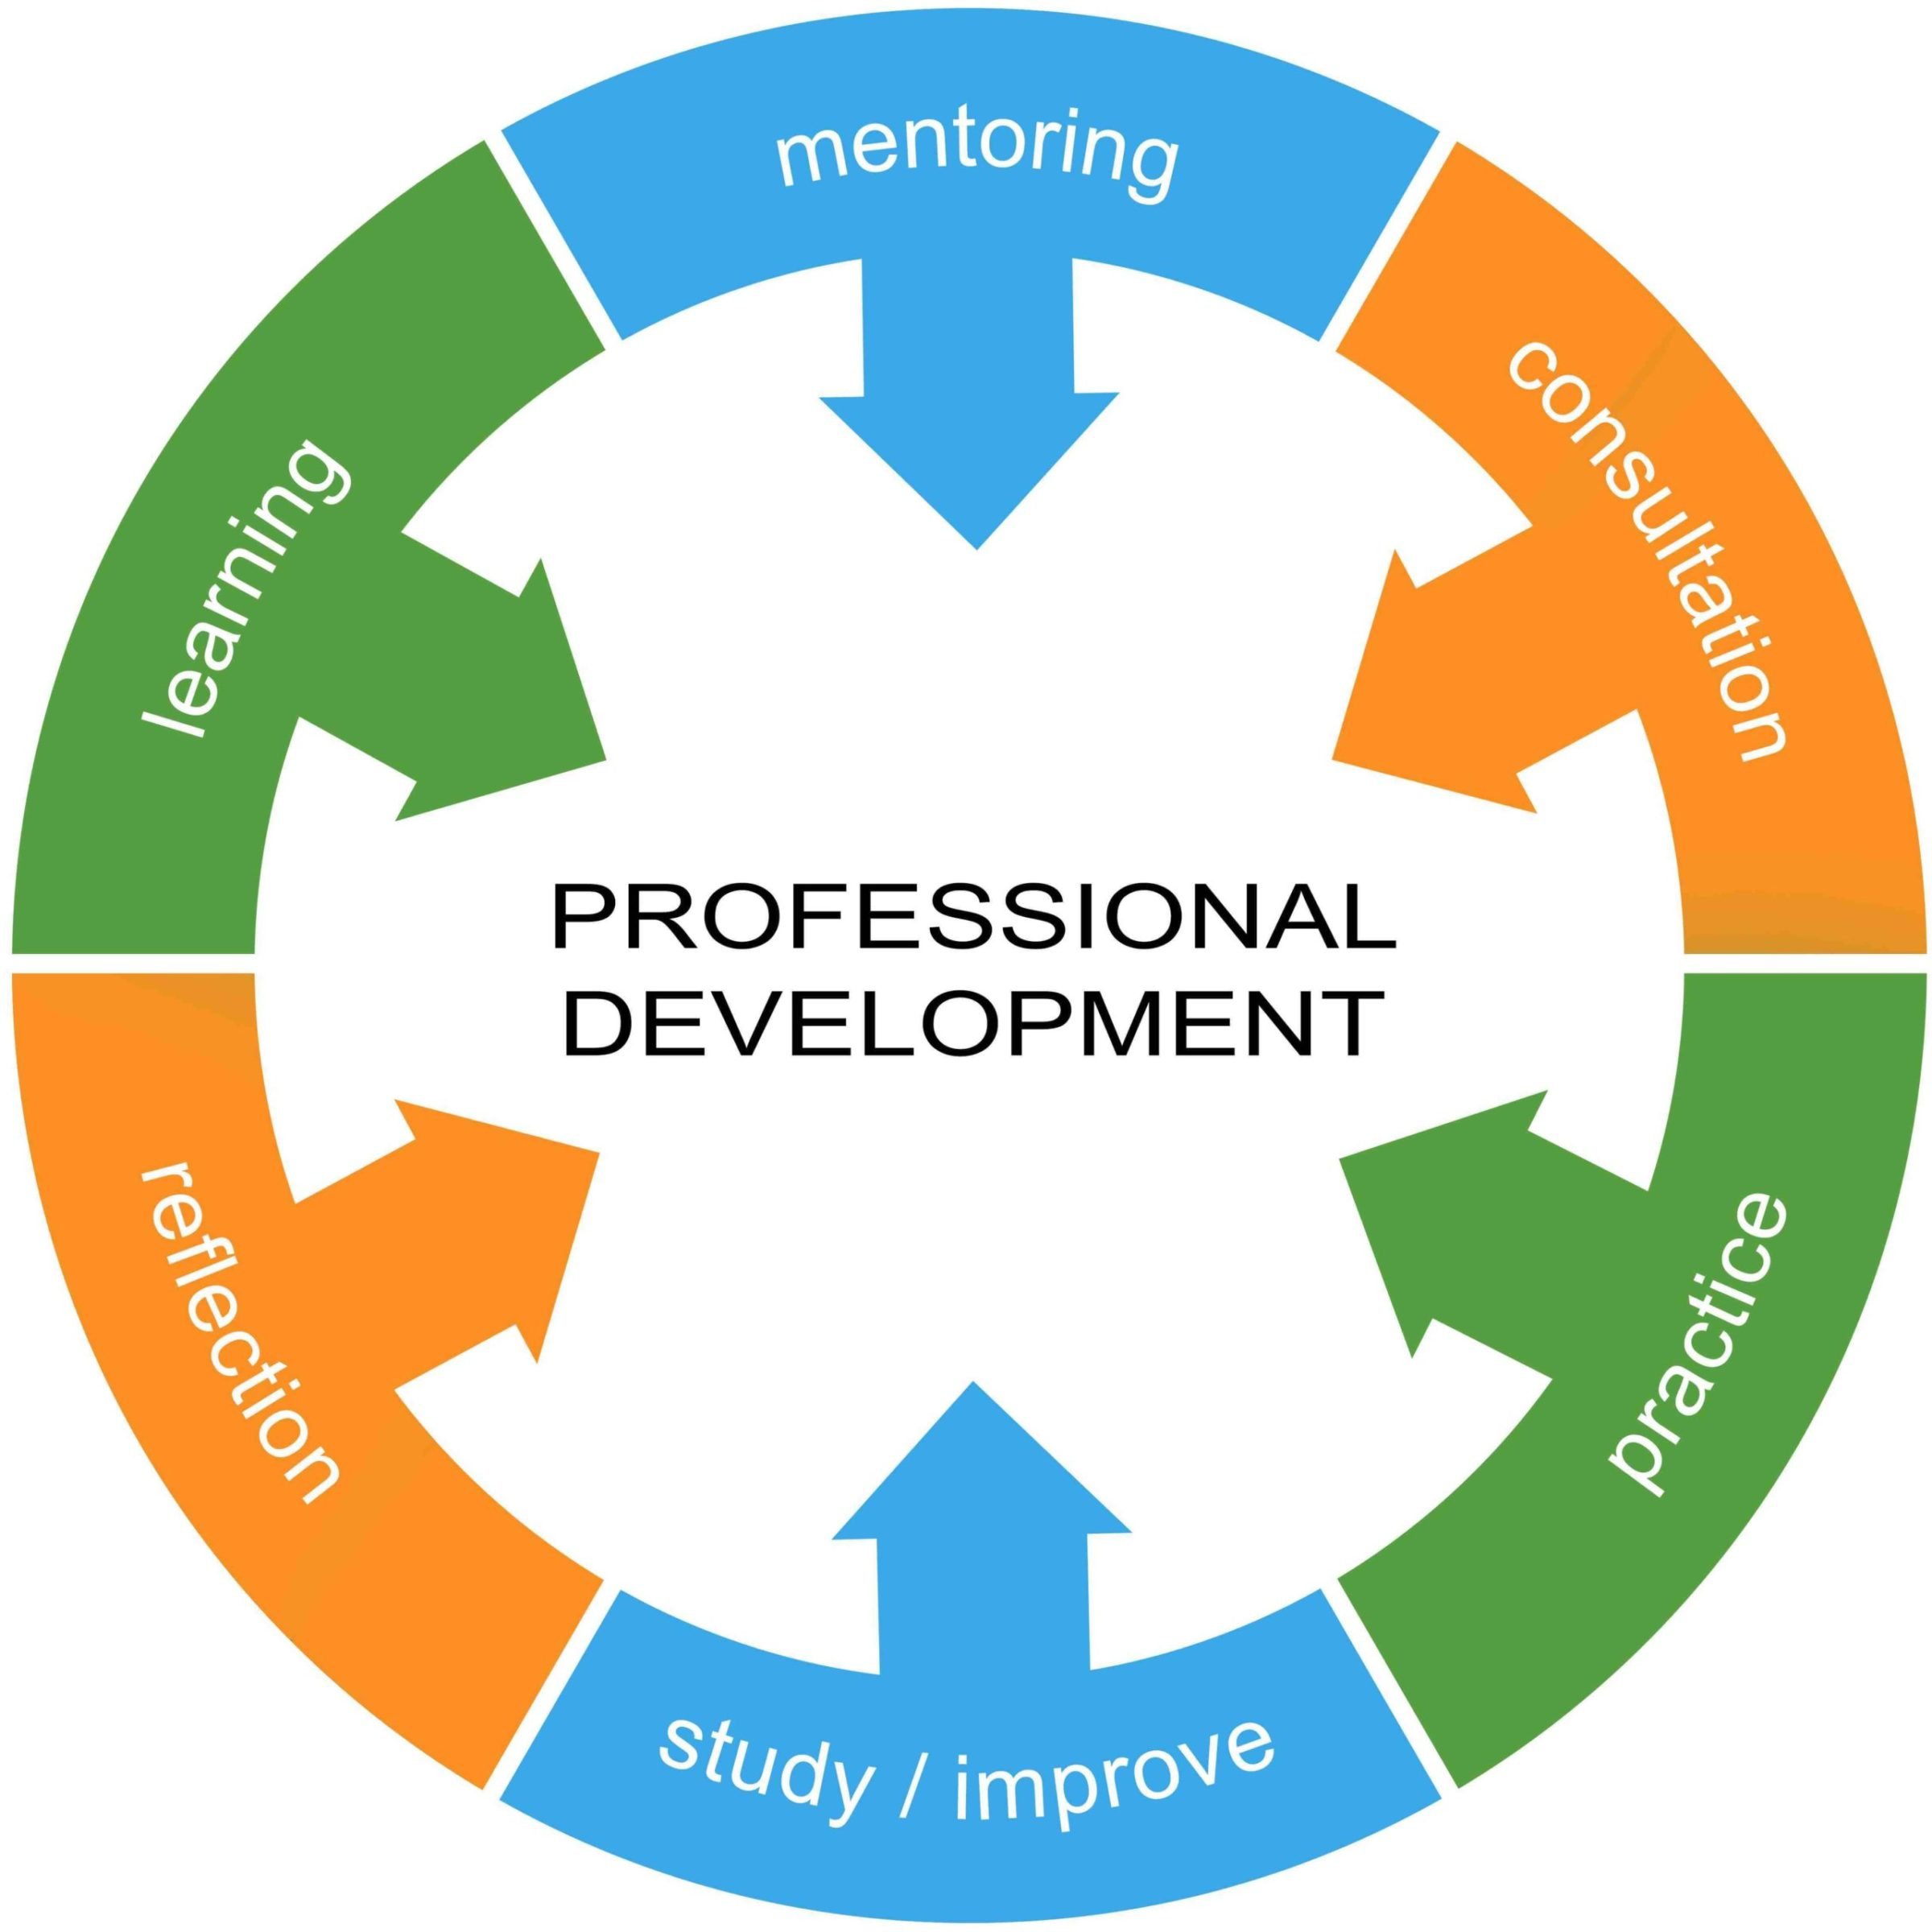 15-Professional-Development-Skills-for-Modern-Teachers-scaled